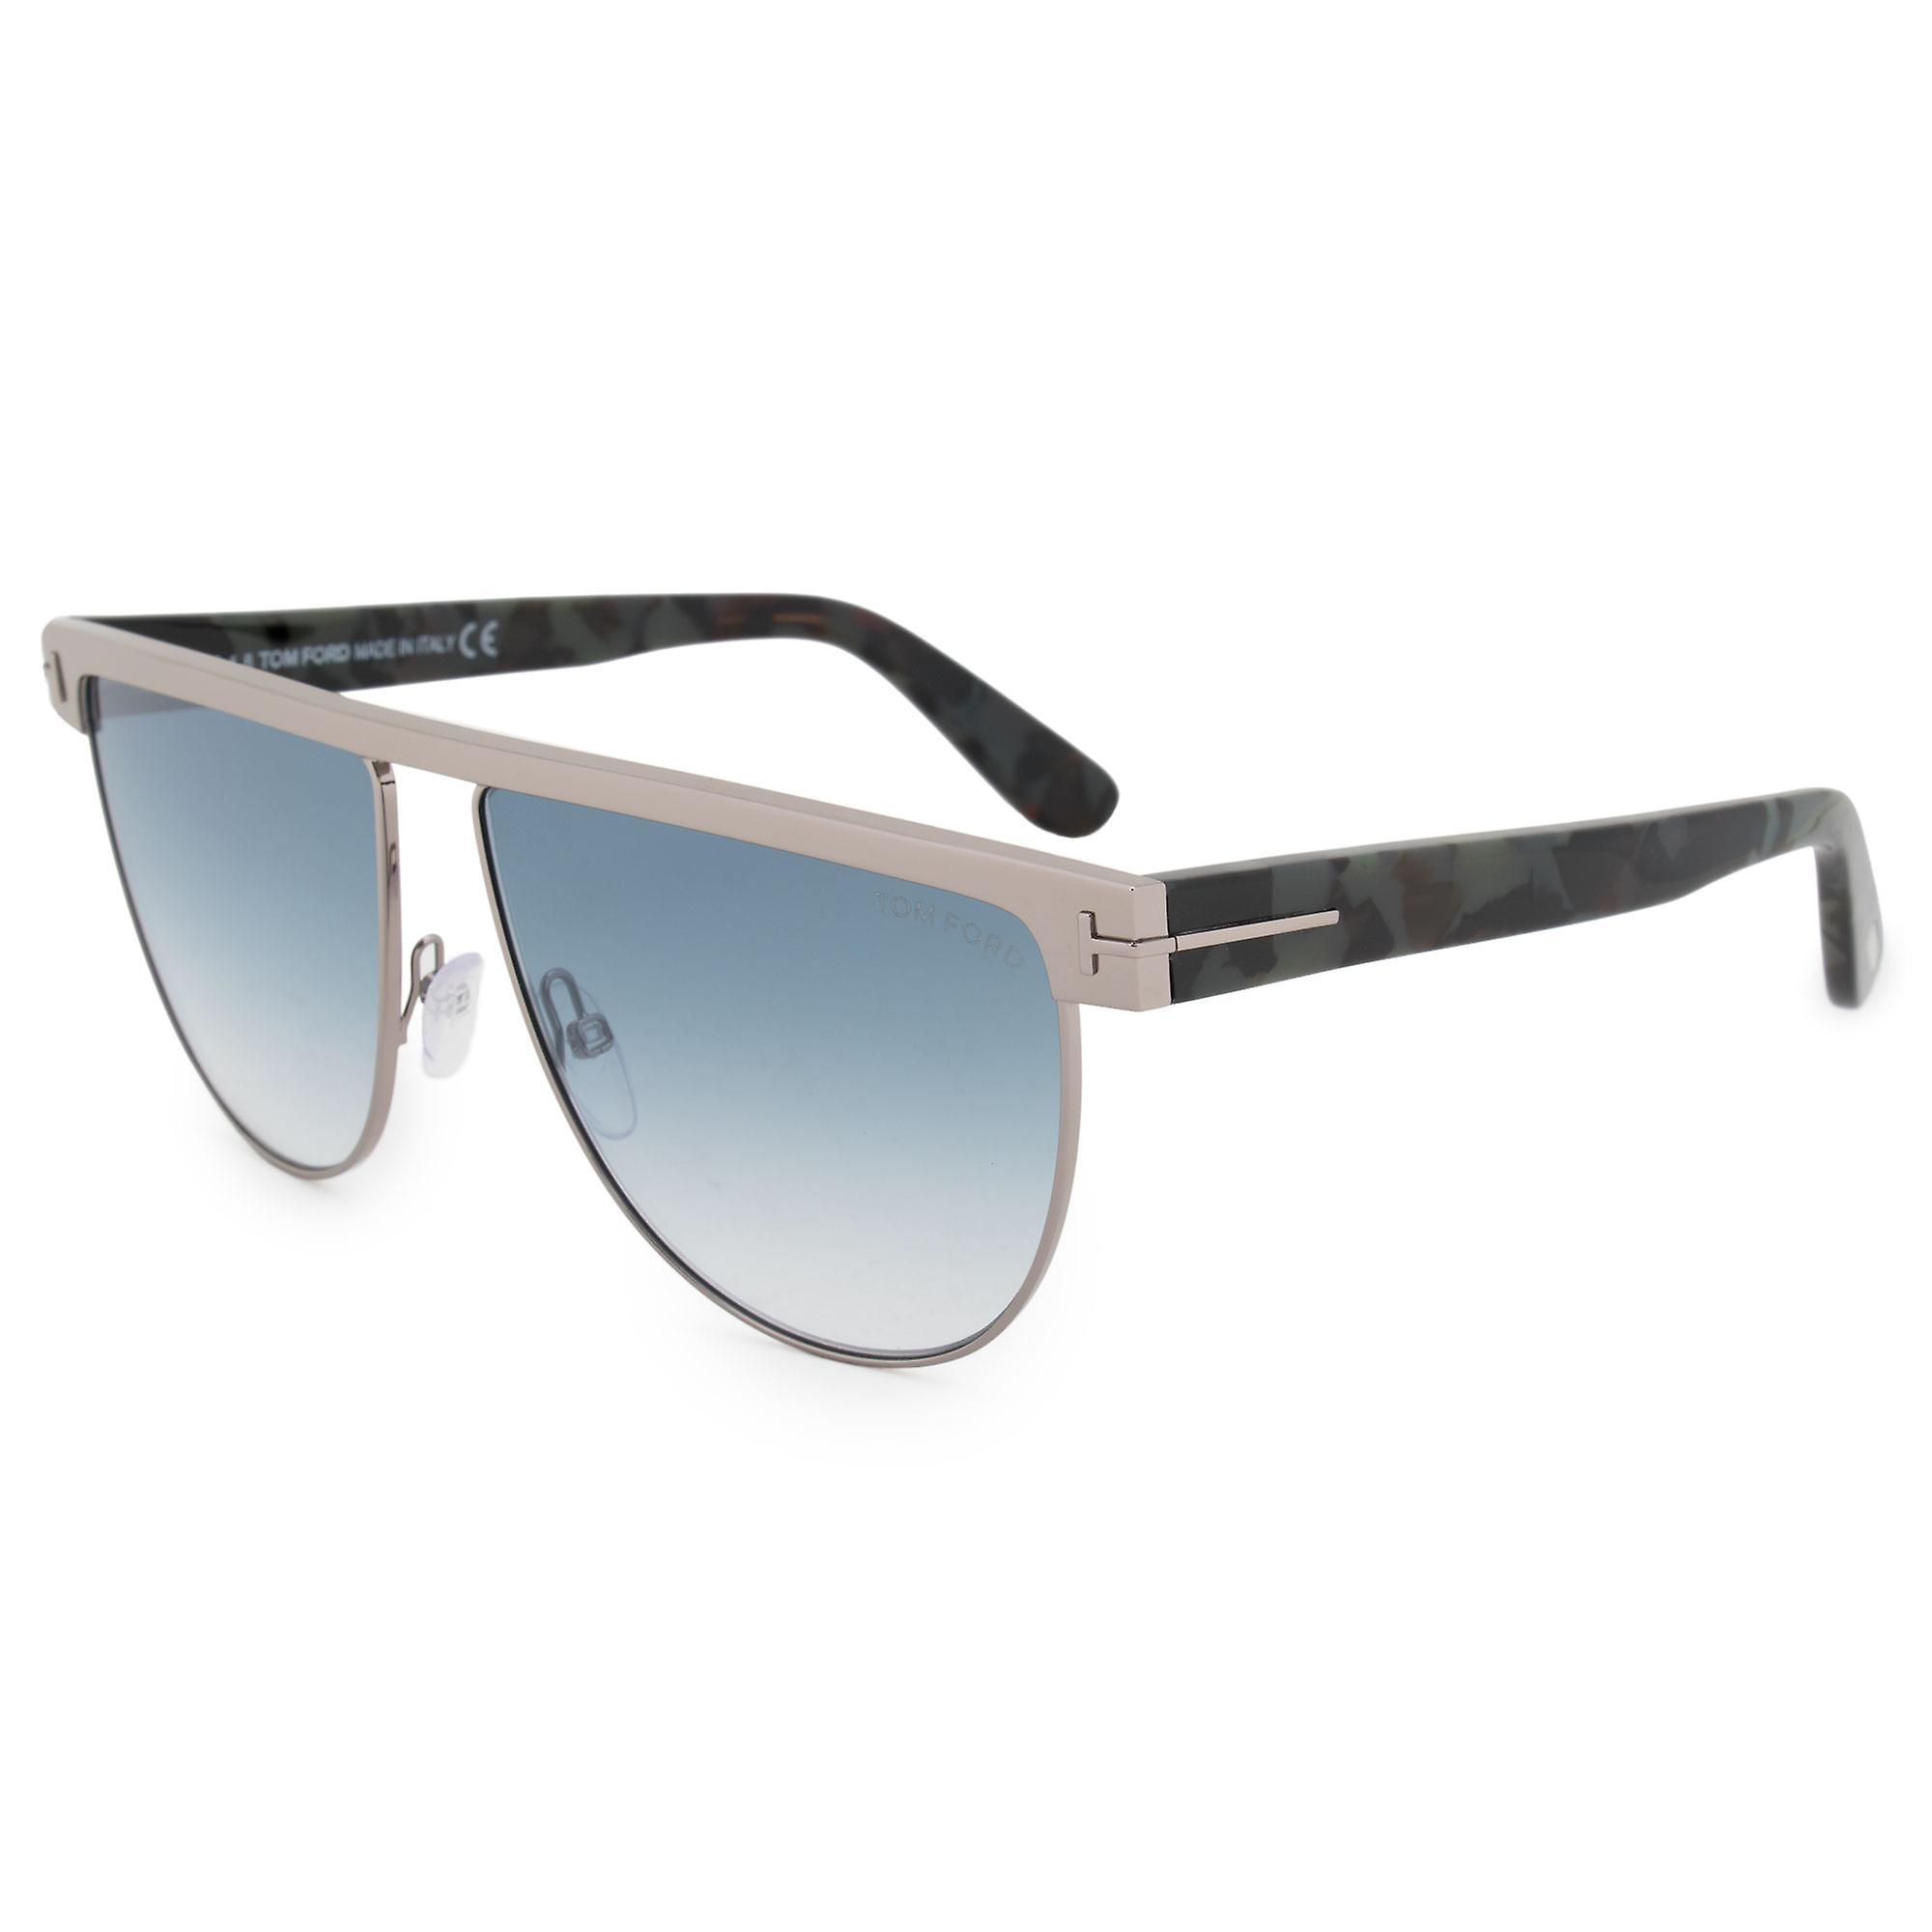 Tom Ford Stephanie-02 Pilot Sunglasses FT0570 14X 60